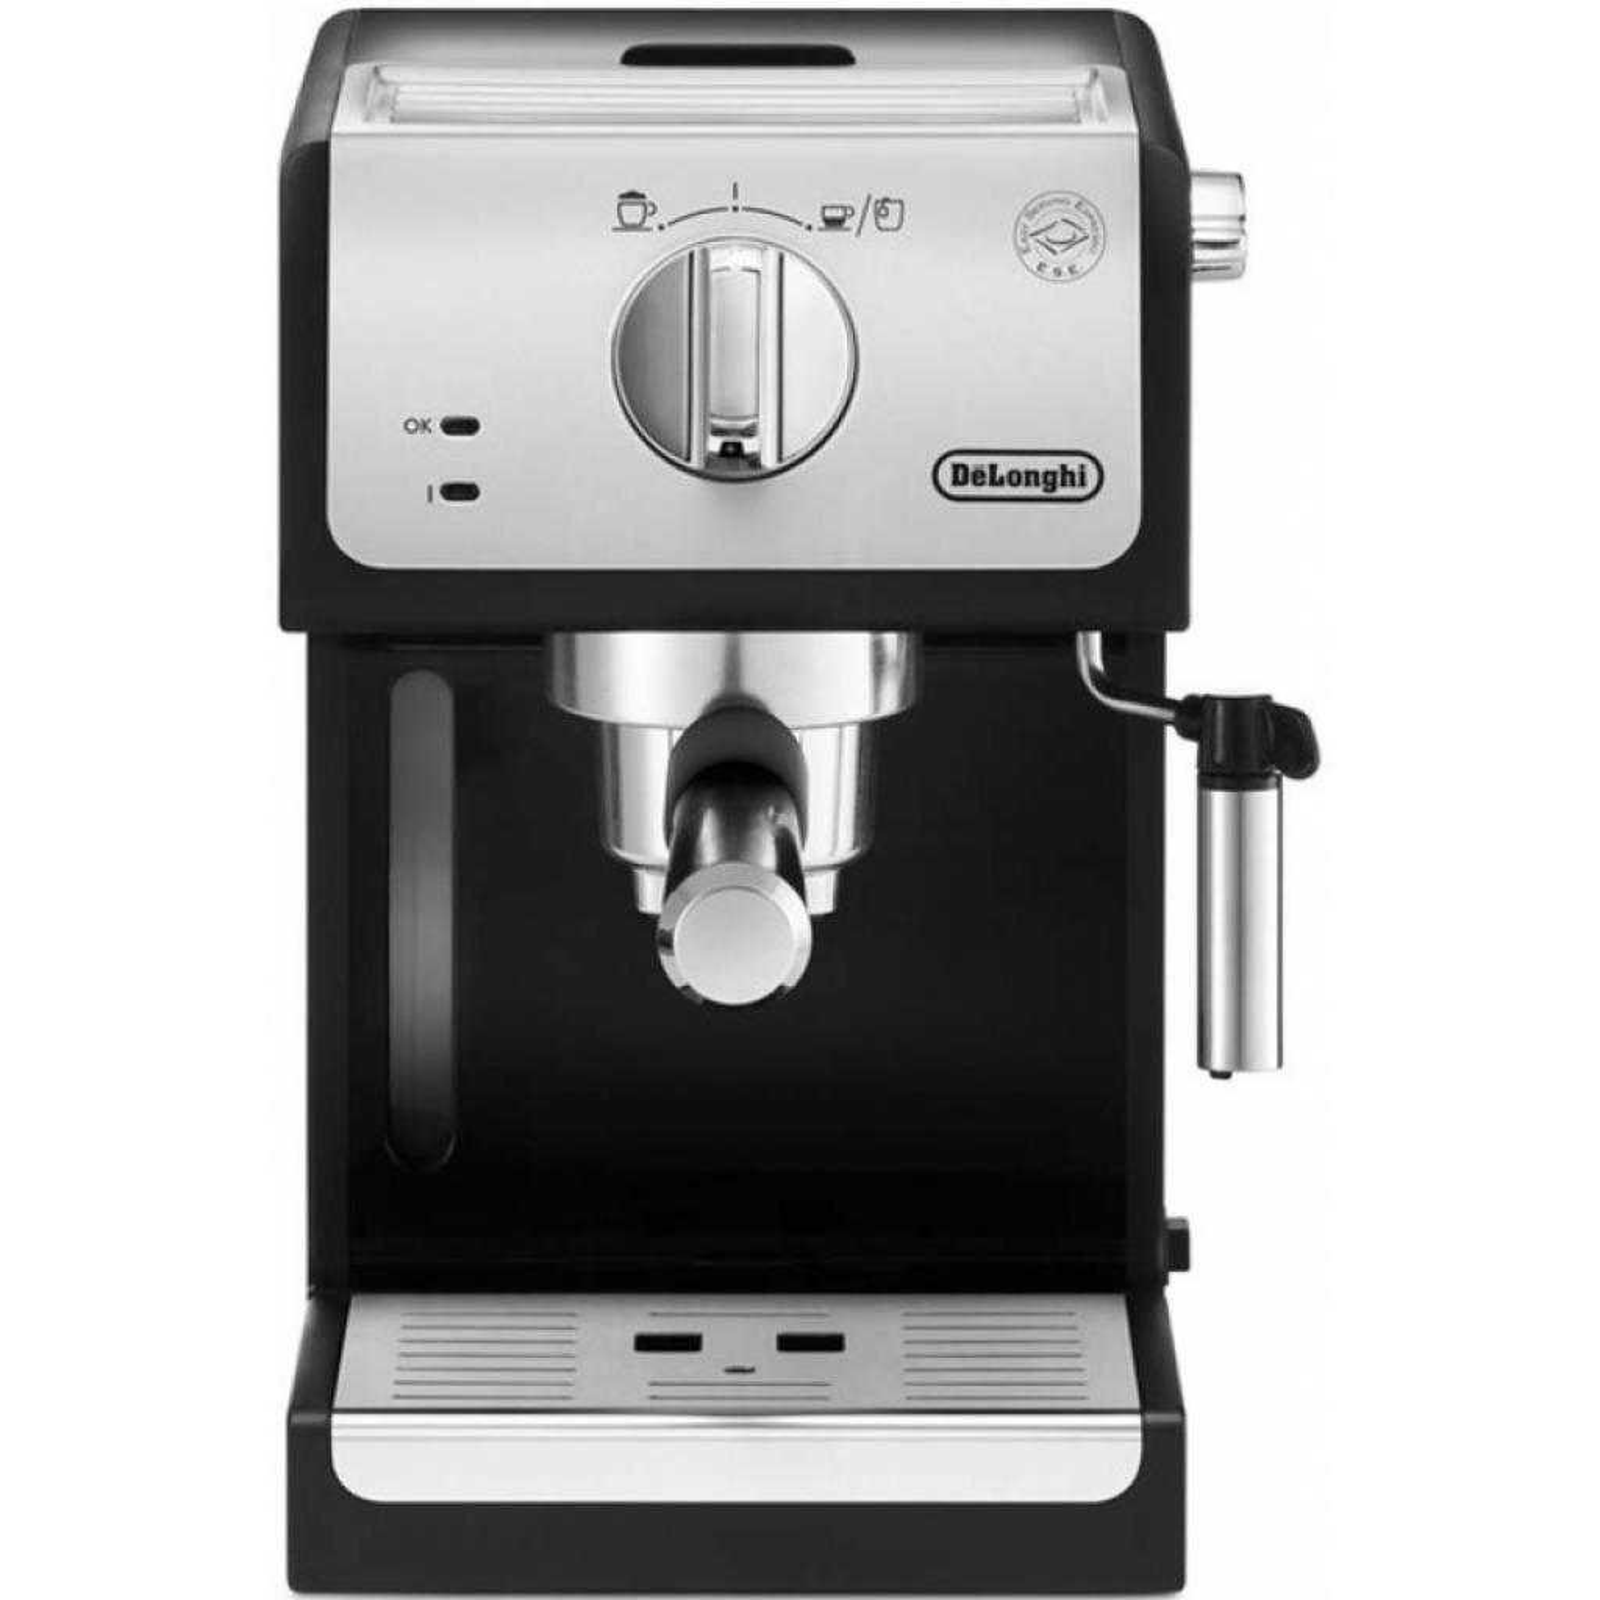 Кофеварка DeLonghi ECP 33.21 BK Silver изображение 2